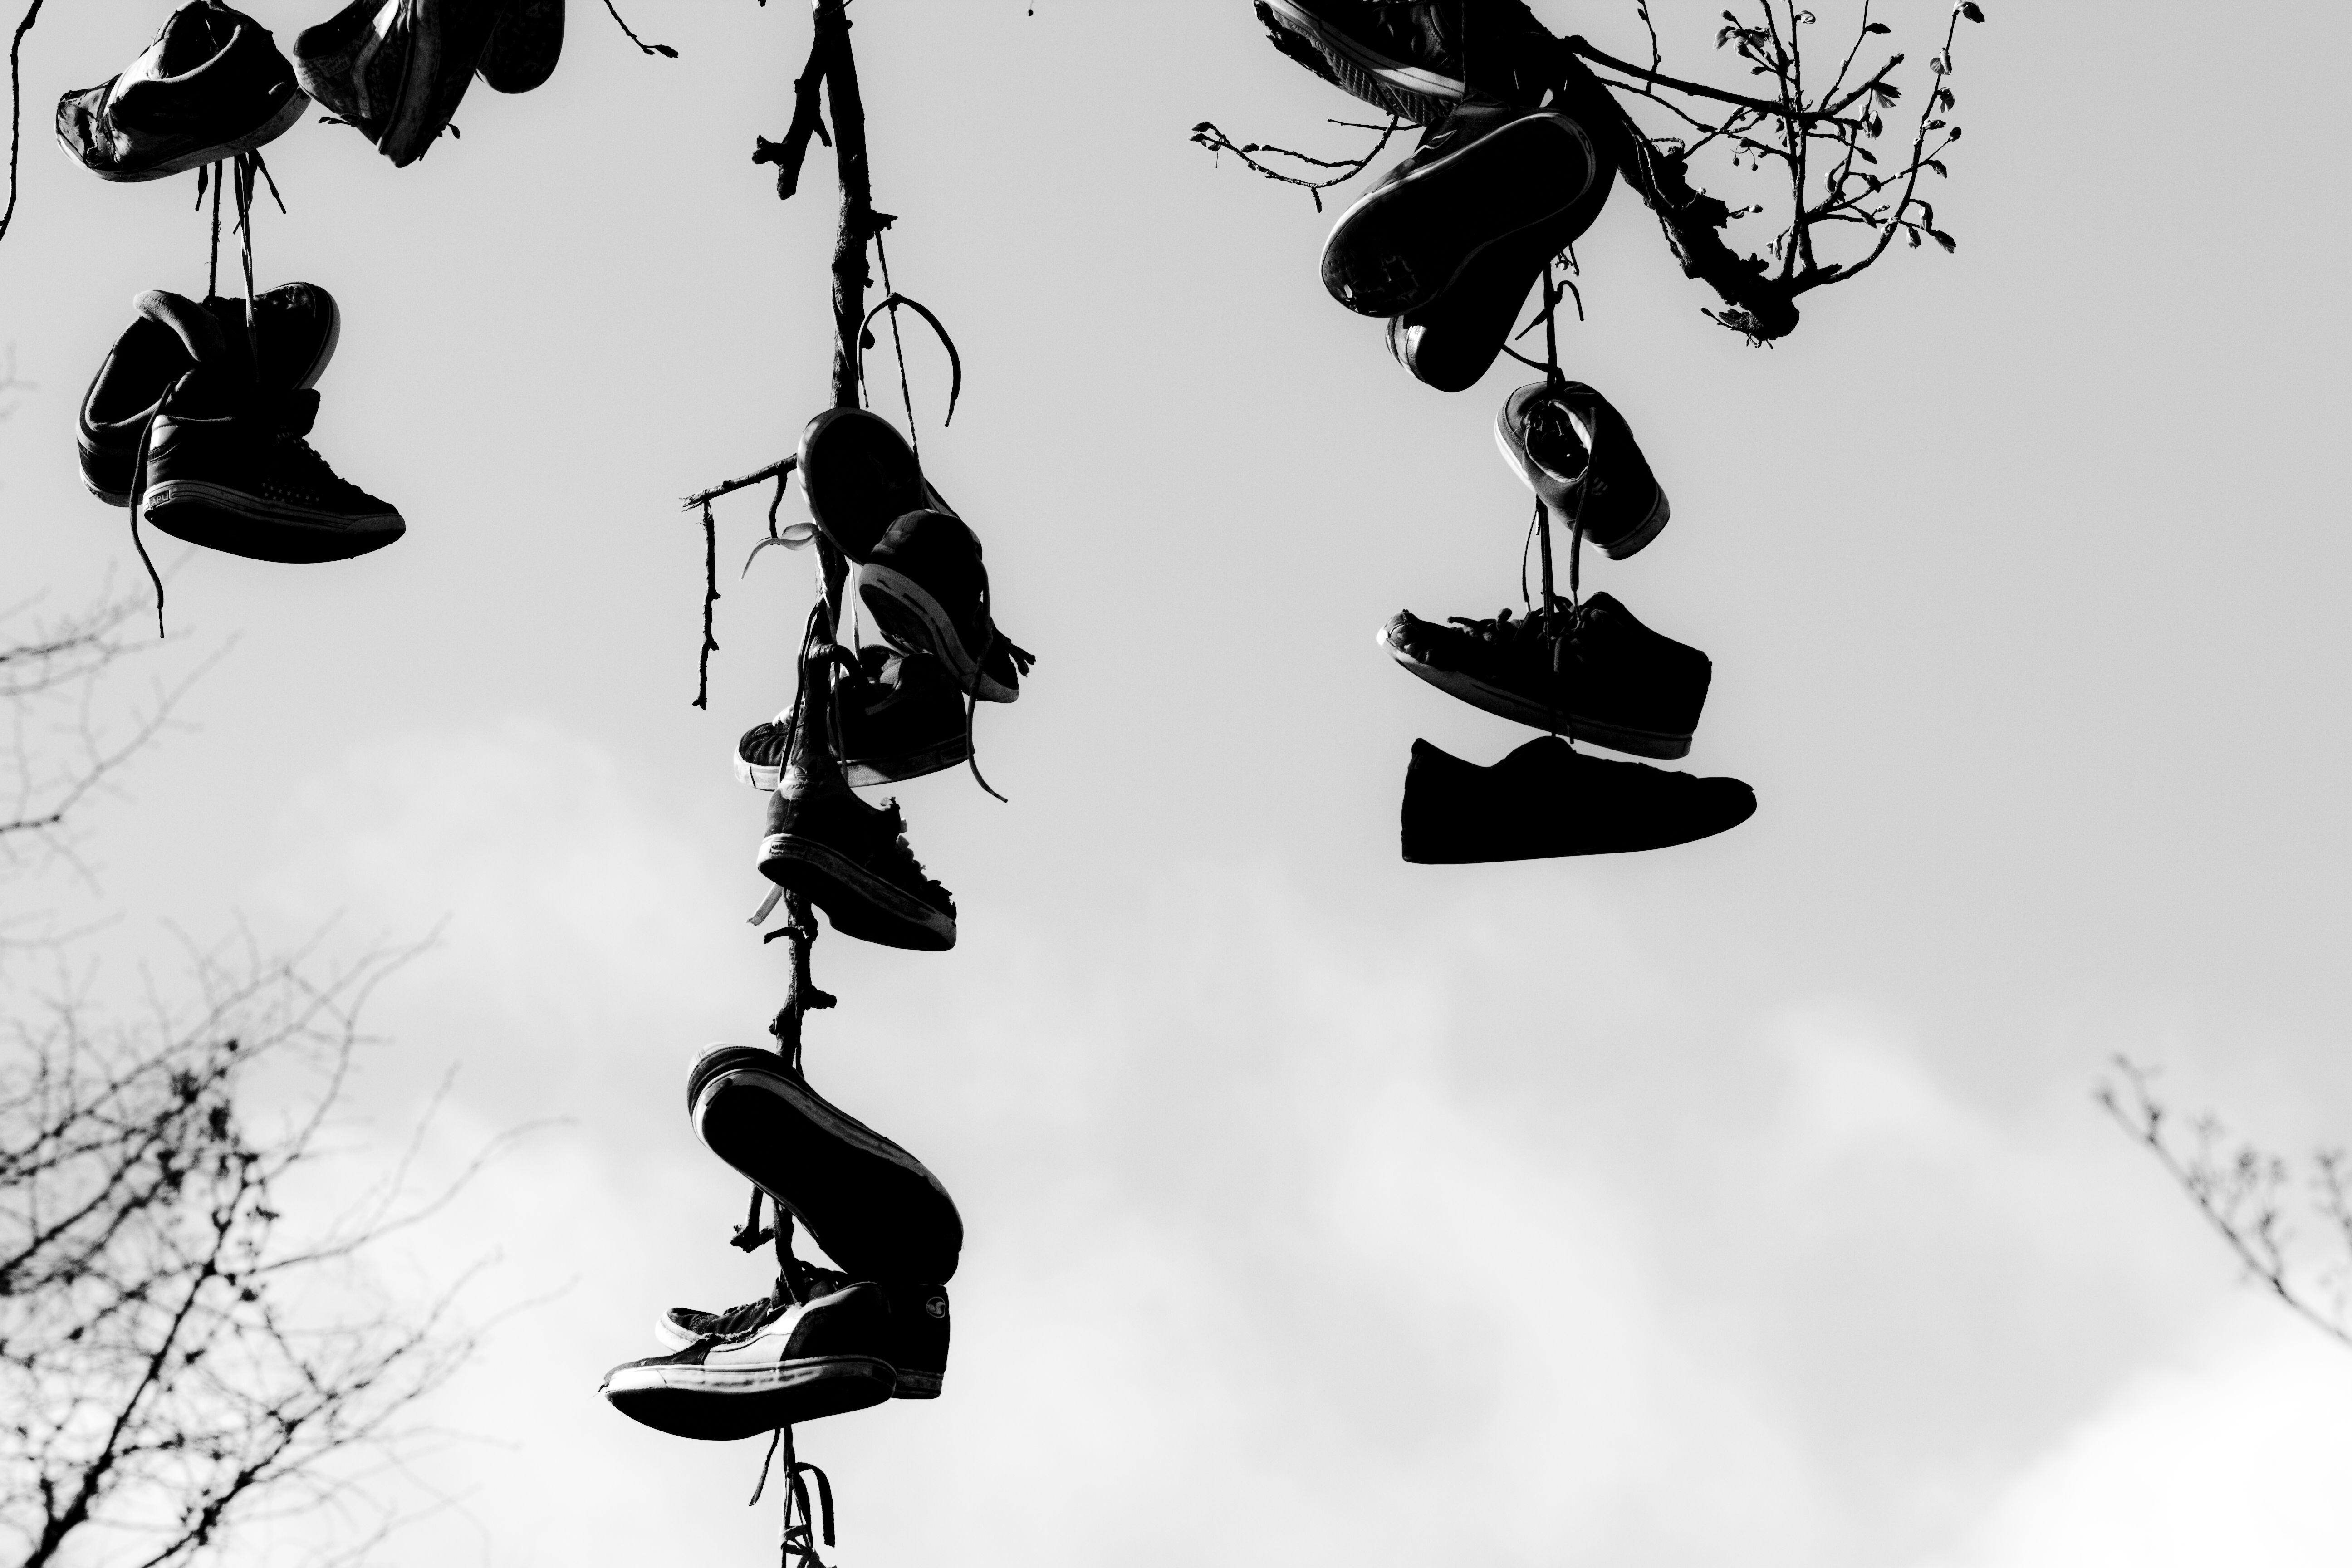 Shoefiti @ Enghaveplads Copenhagen